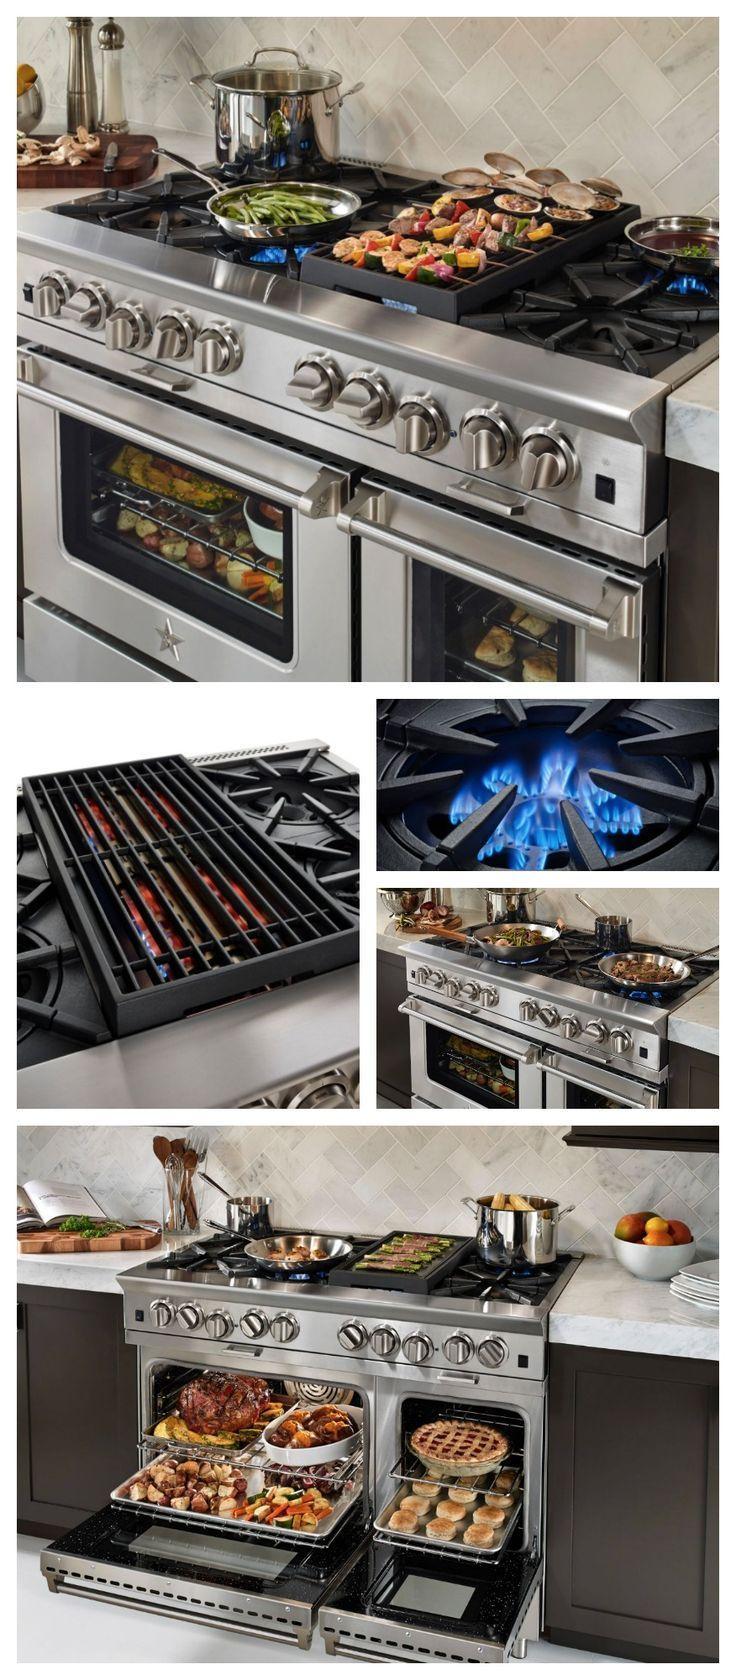 Uncategorized Big Lots Kitchen Appliances 25 best ideas about big kitchen on pinterest dream kitchens kitchens